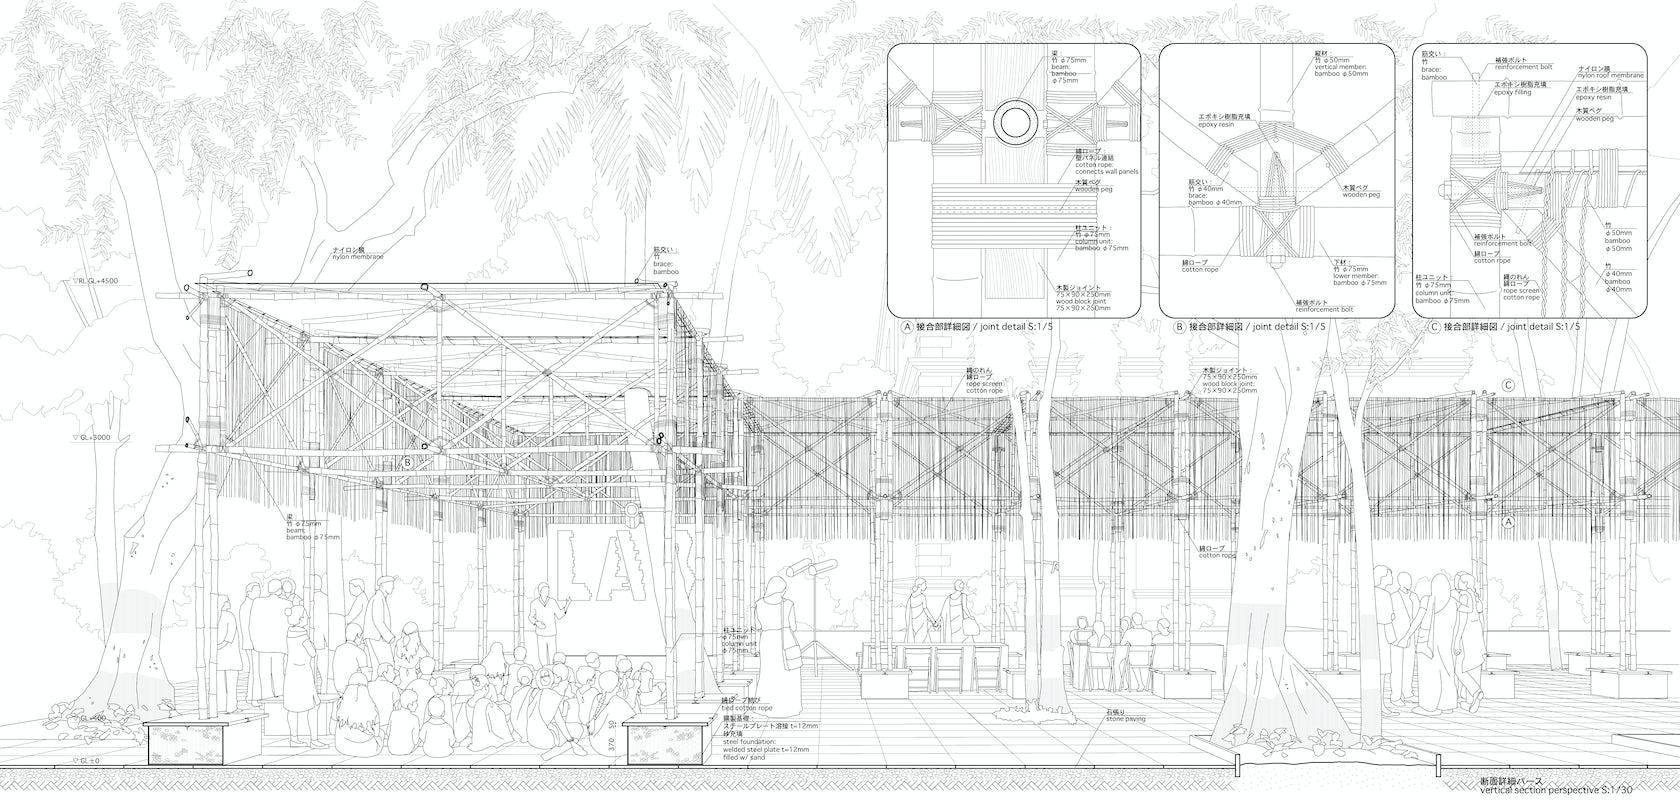 BMW Guggenheim Lab Mumbai on Architizer